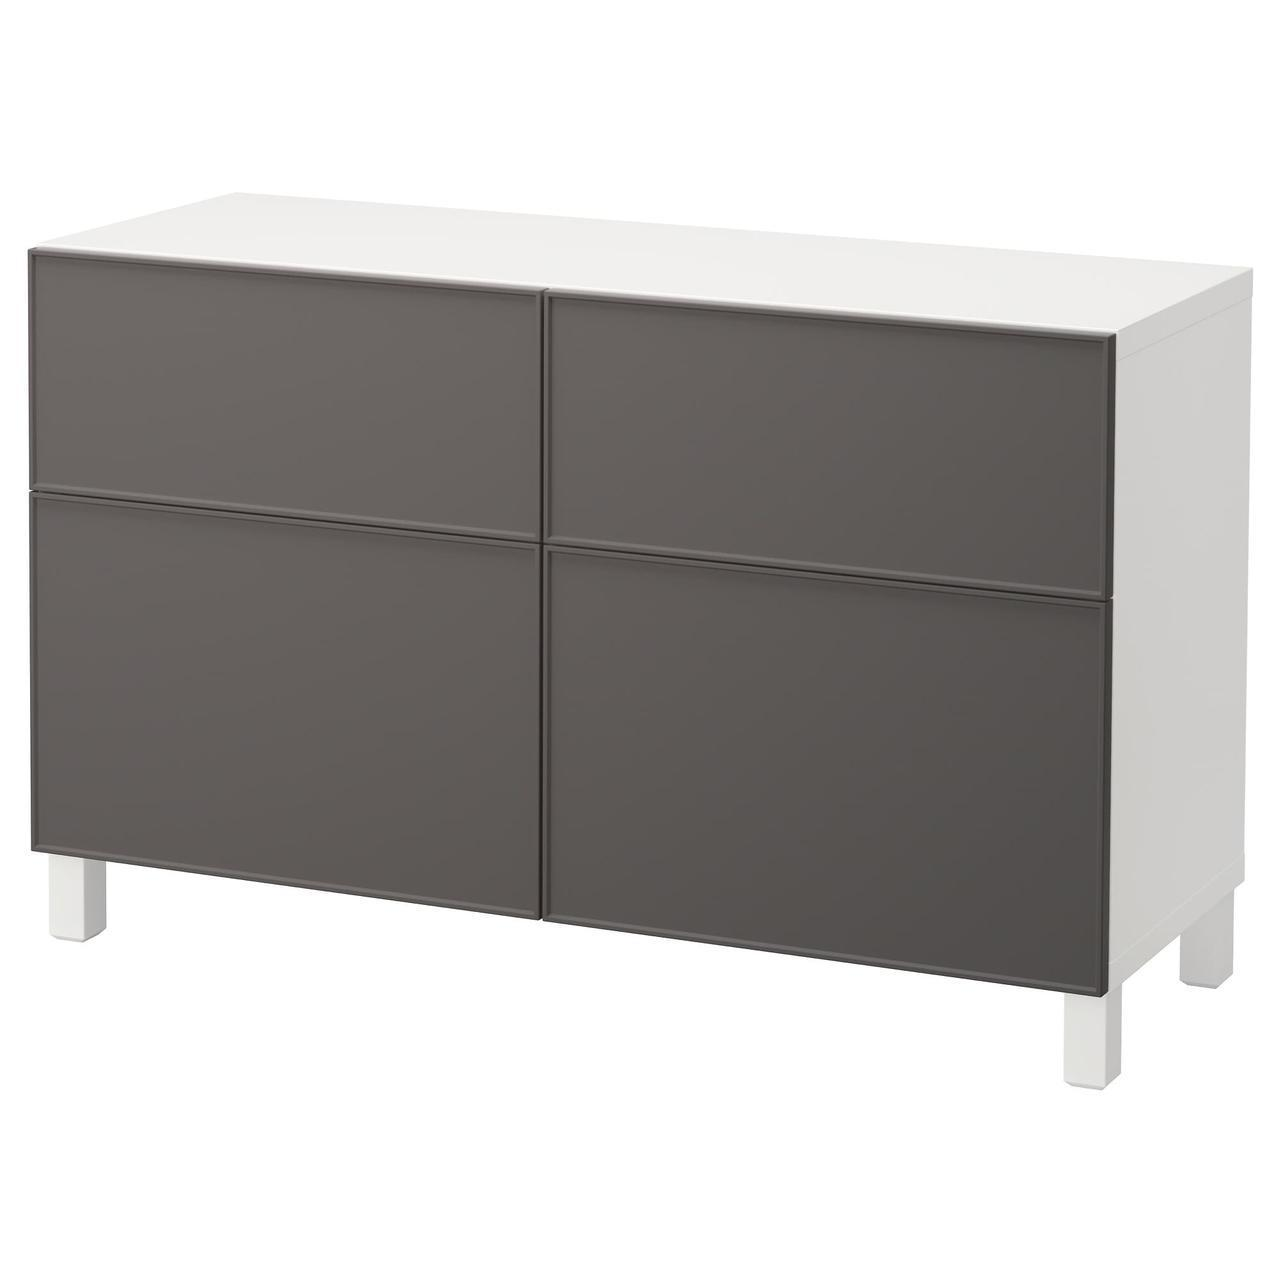 Тумба IKEA BESTÅ 120x40x74 см Grundsviken белая темно-серая 292.060.67